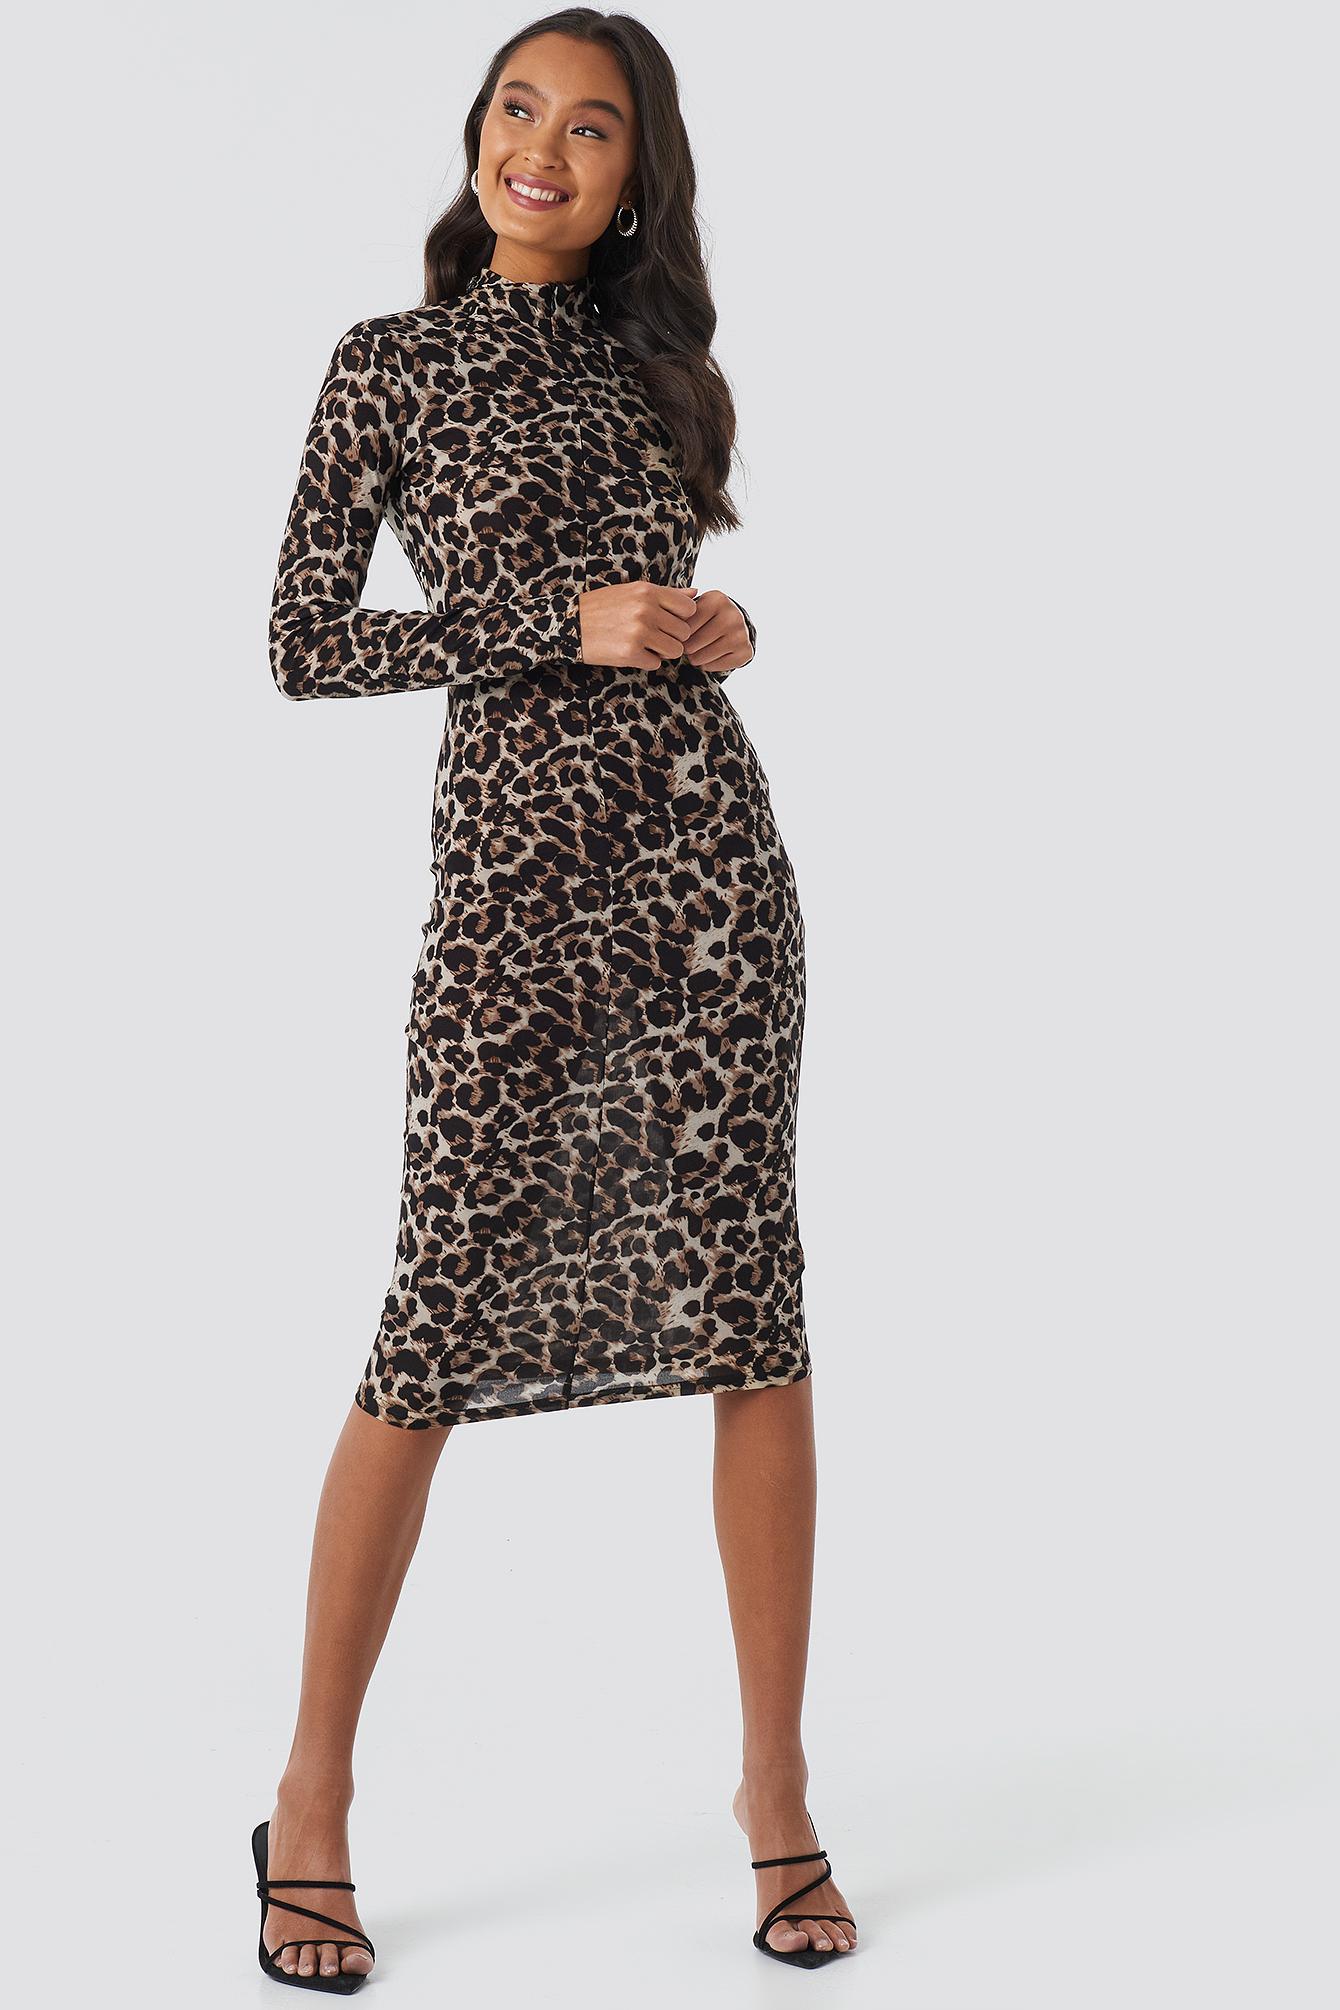 Front Zipper Skin Tight Jersey Dress NA-KD.COM